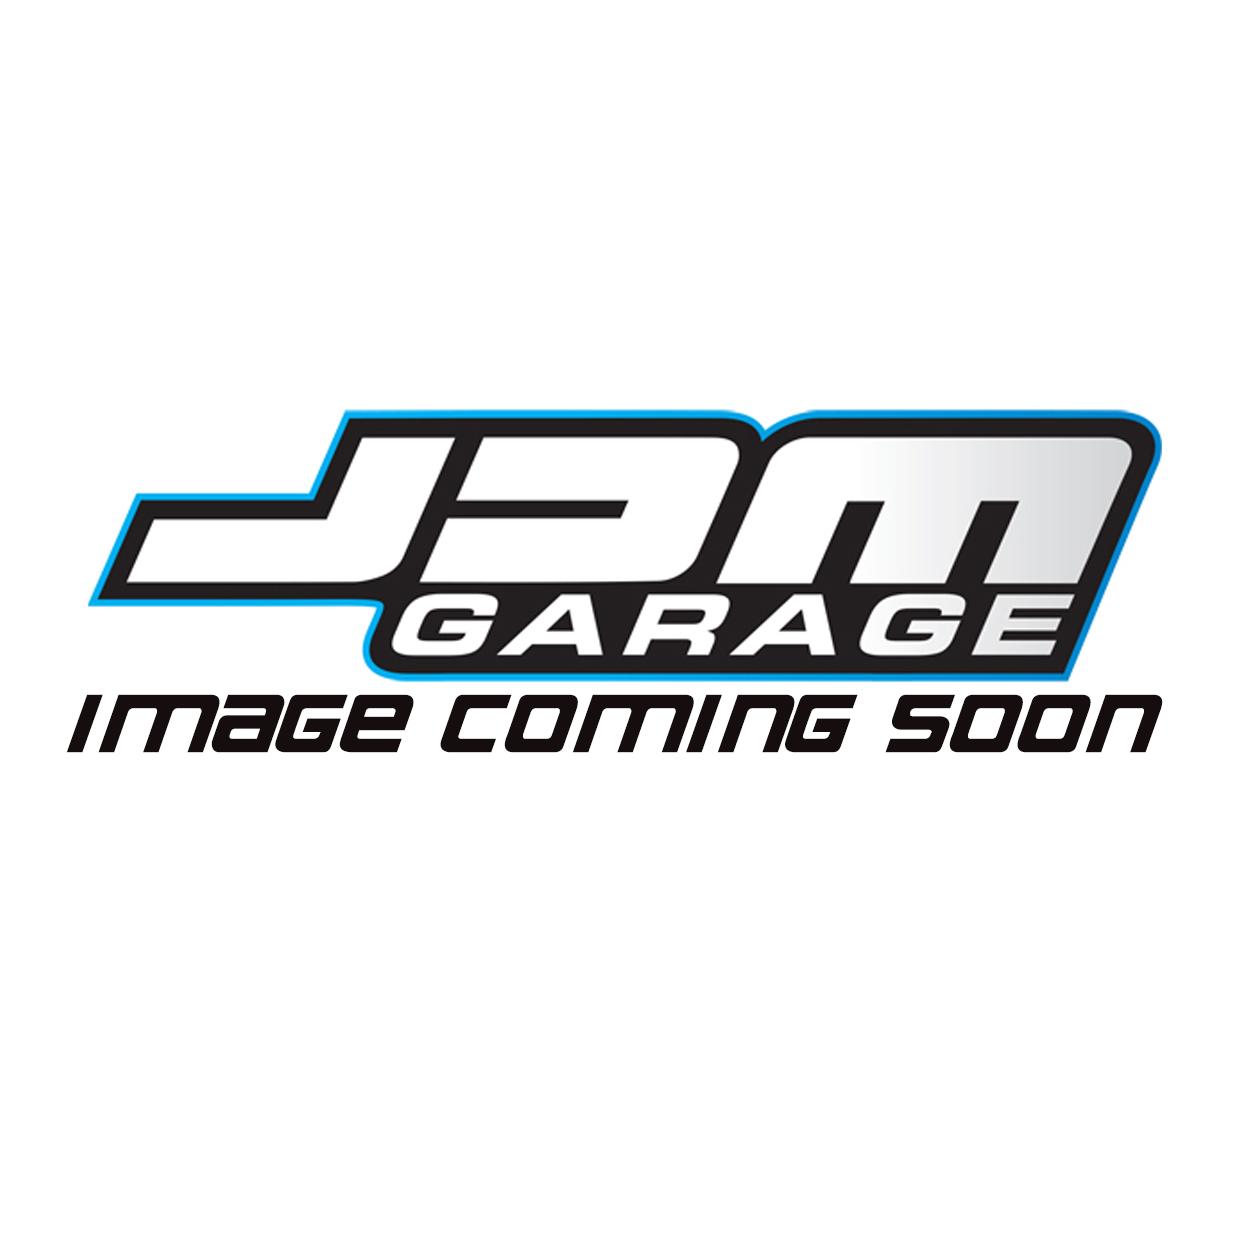 Mcleod Tuner Series Clutches Subaru BRZ / Toyota GT86